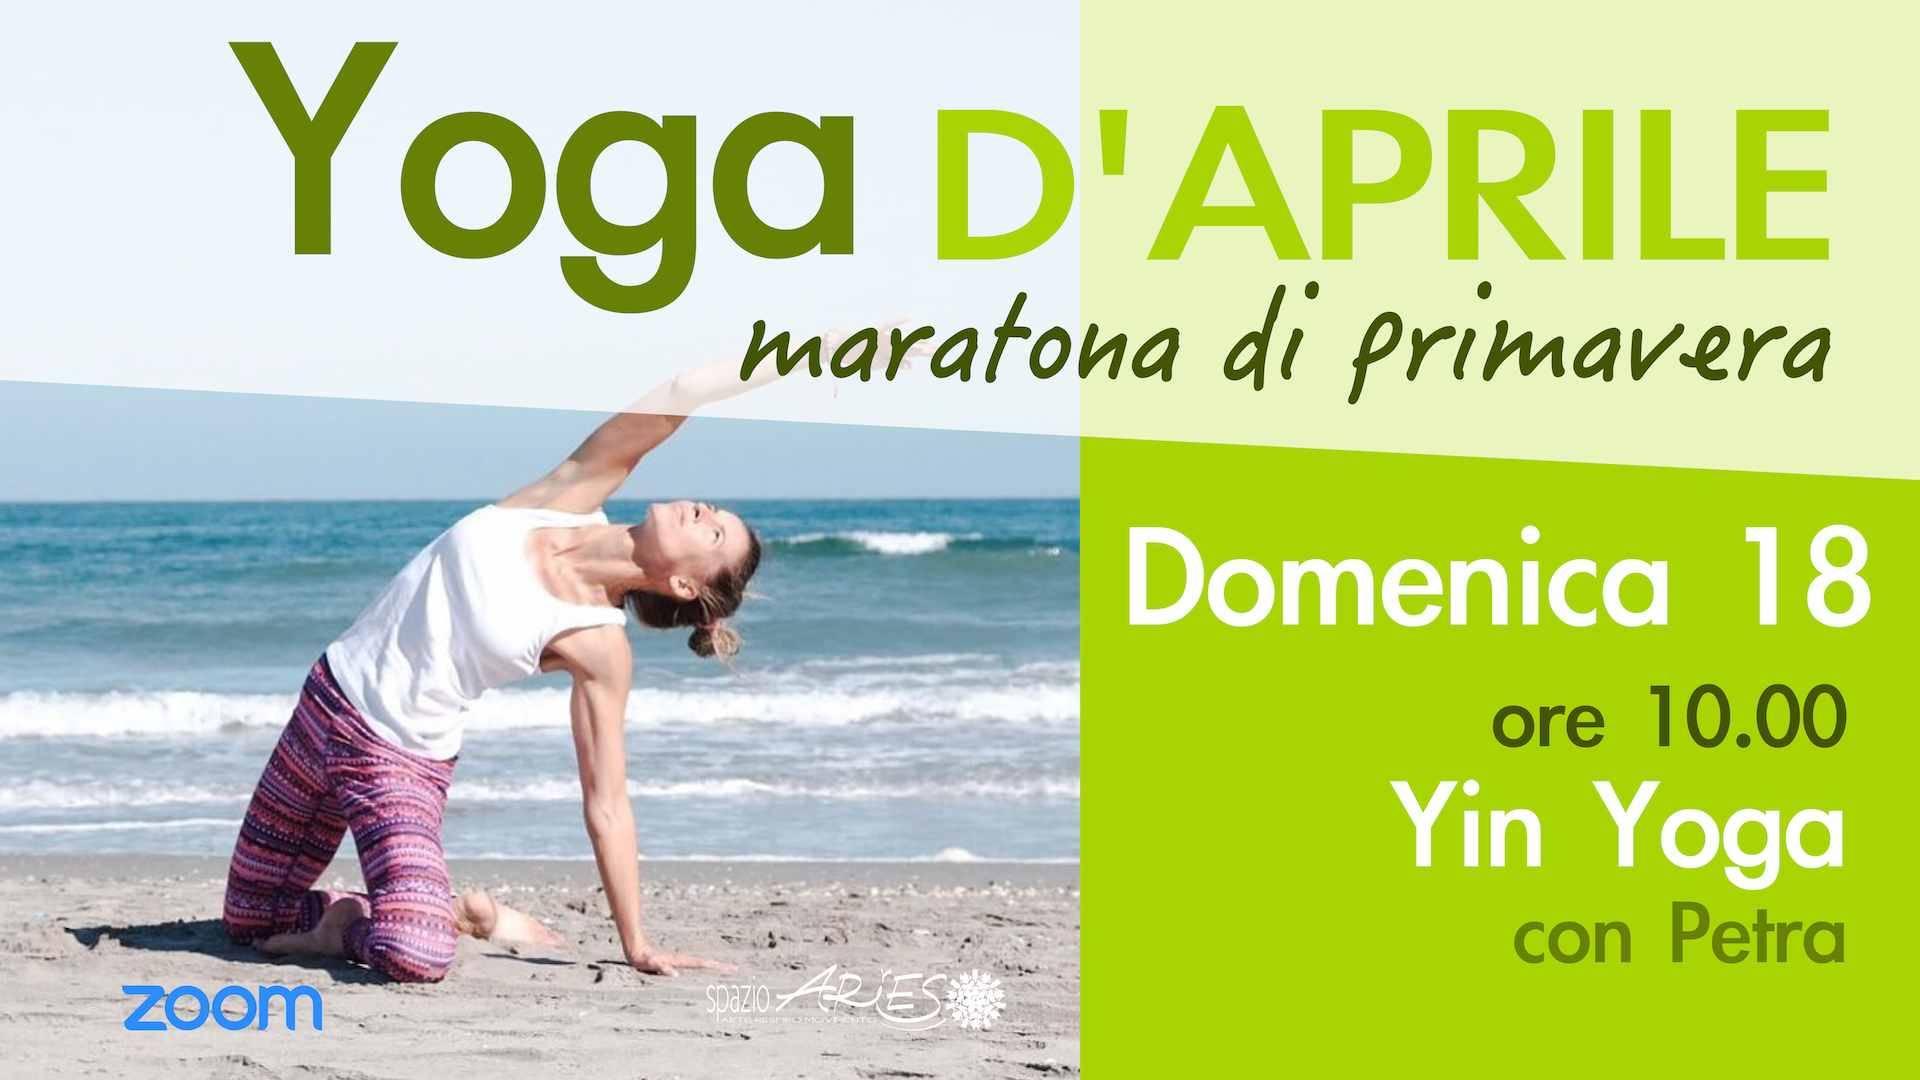 Yin Yoga online con Petra